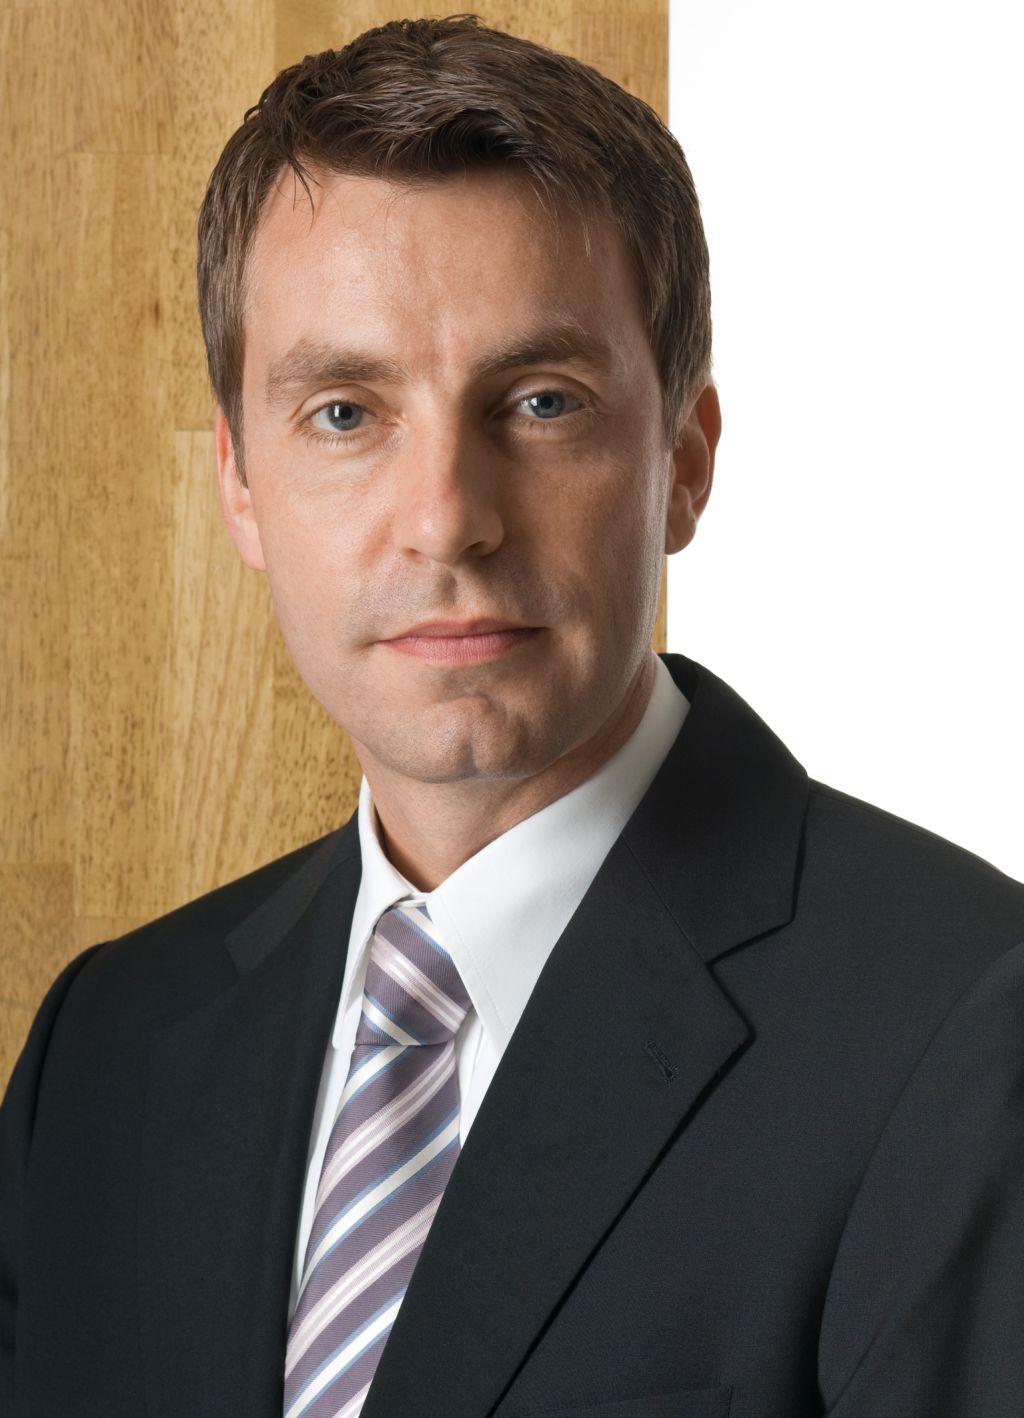 Georg Lahme (c) Klenk & Hoursch